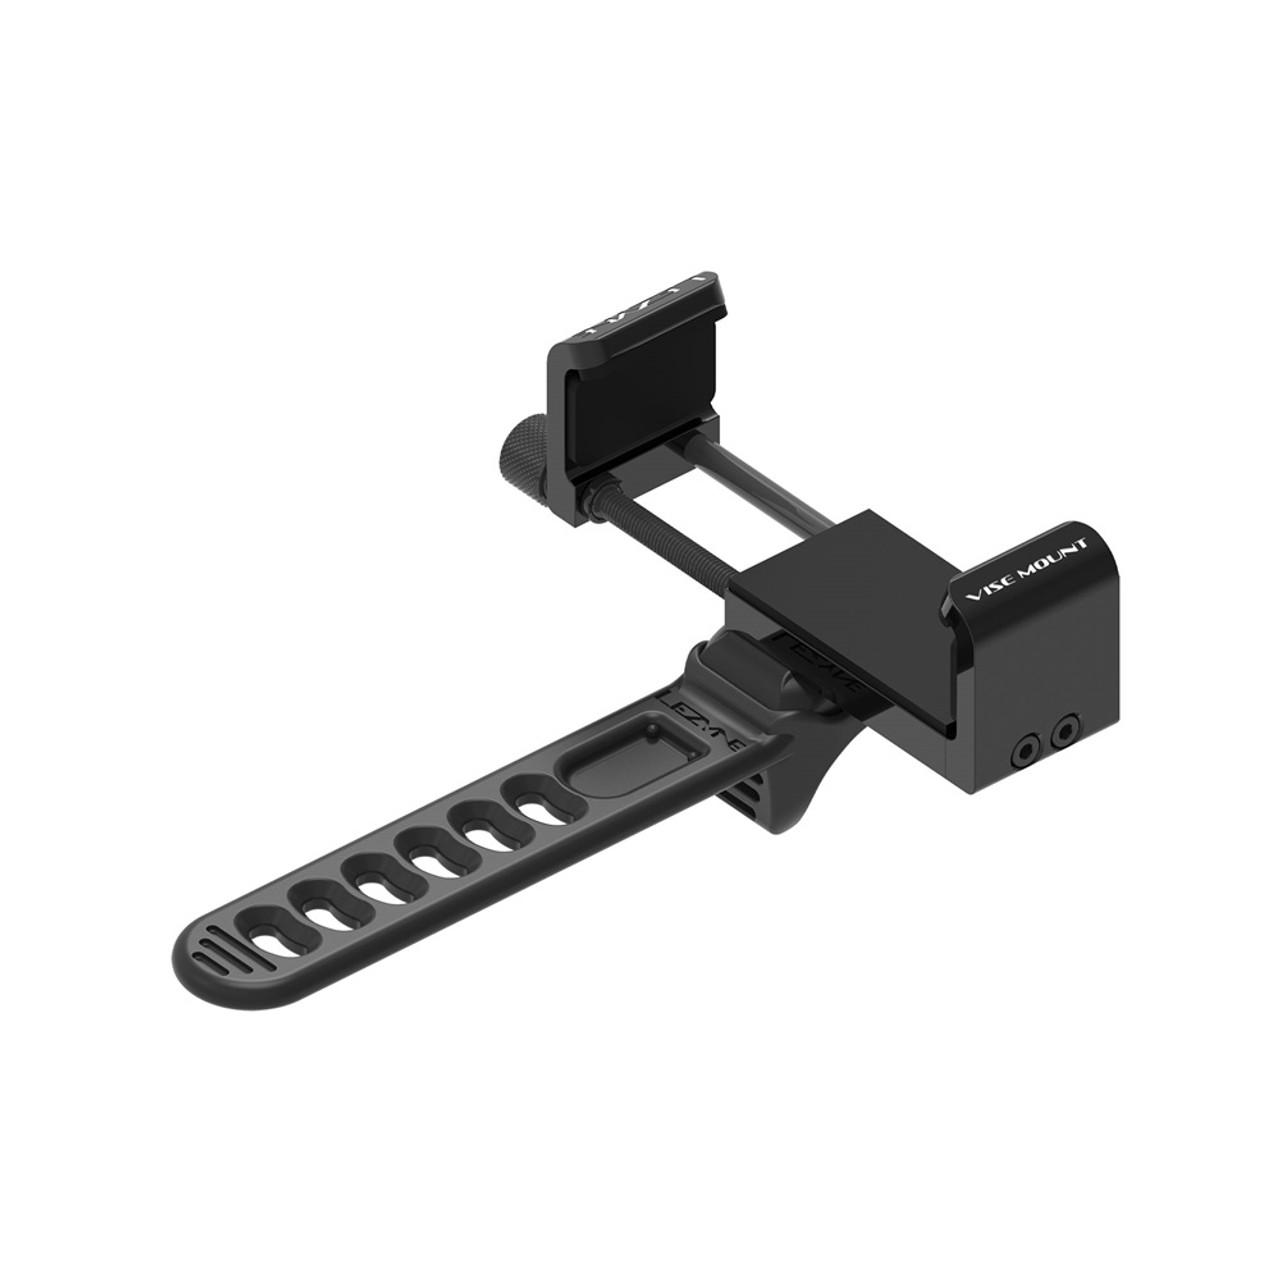 Lezyne Smart Vice Phone Mount In Black